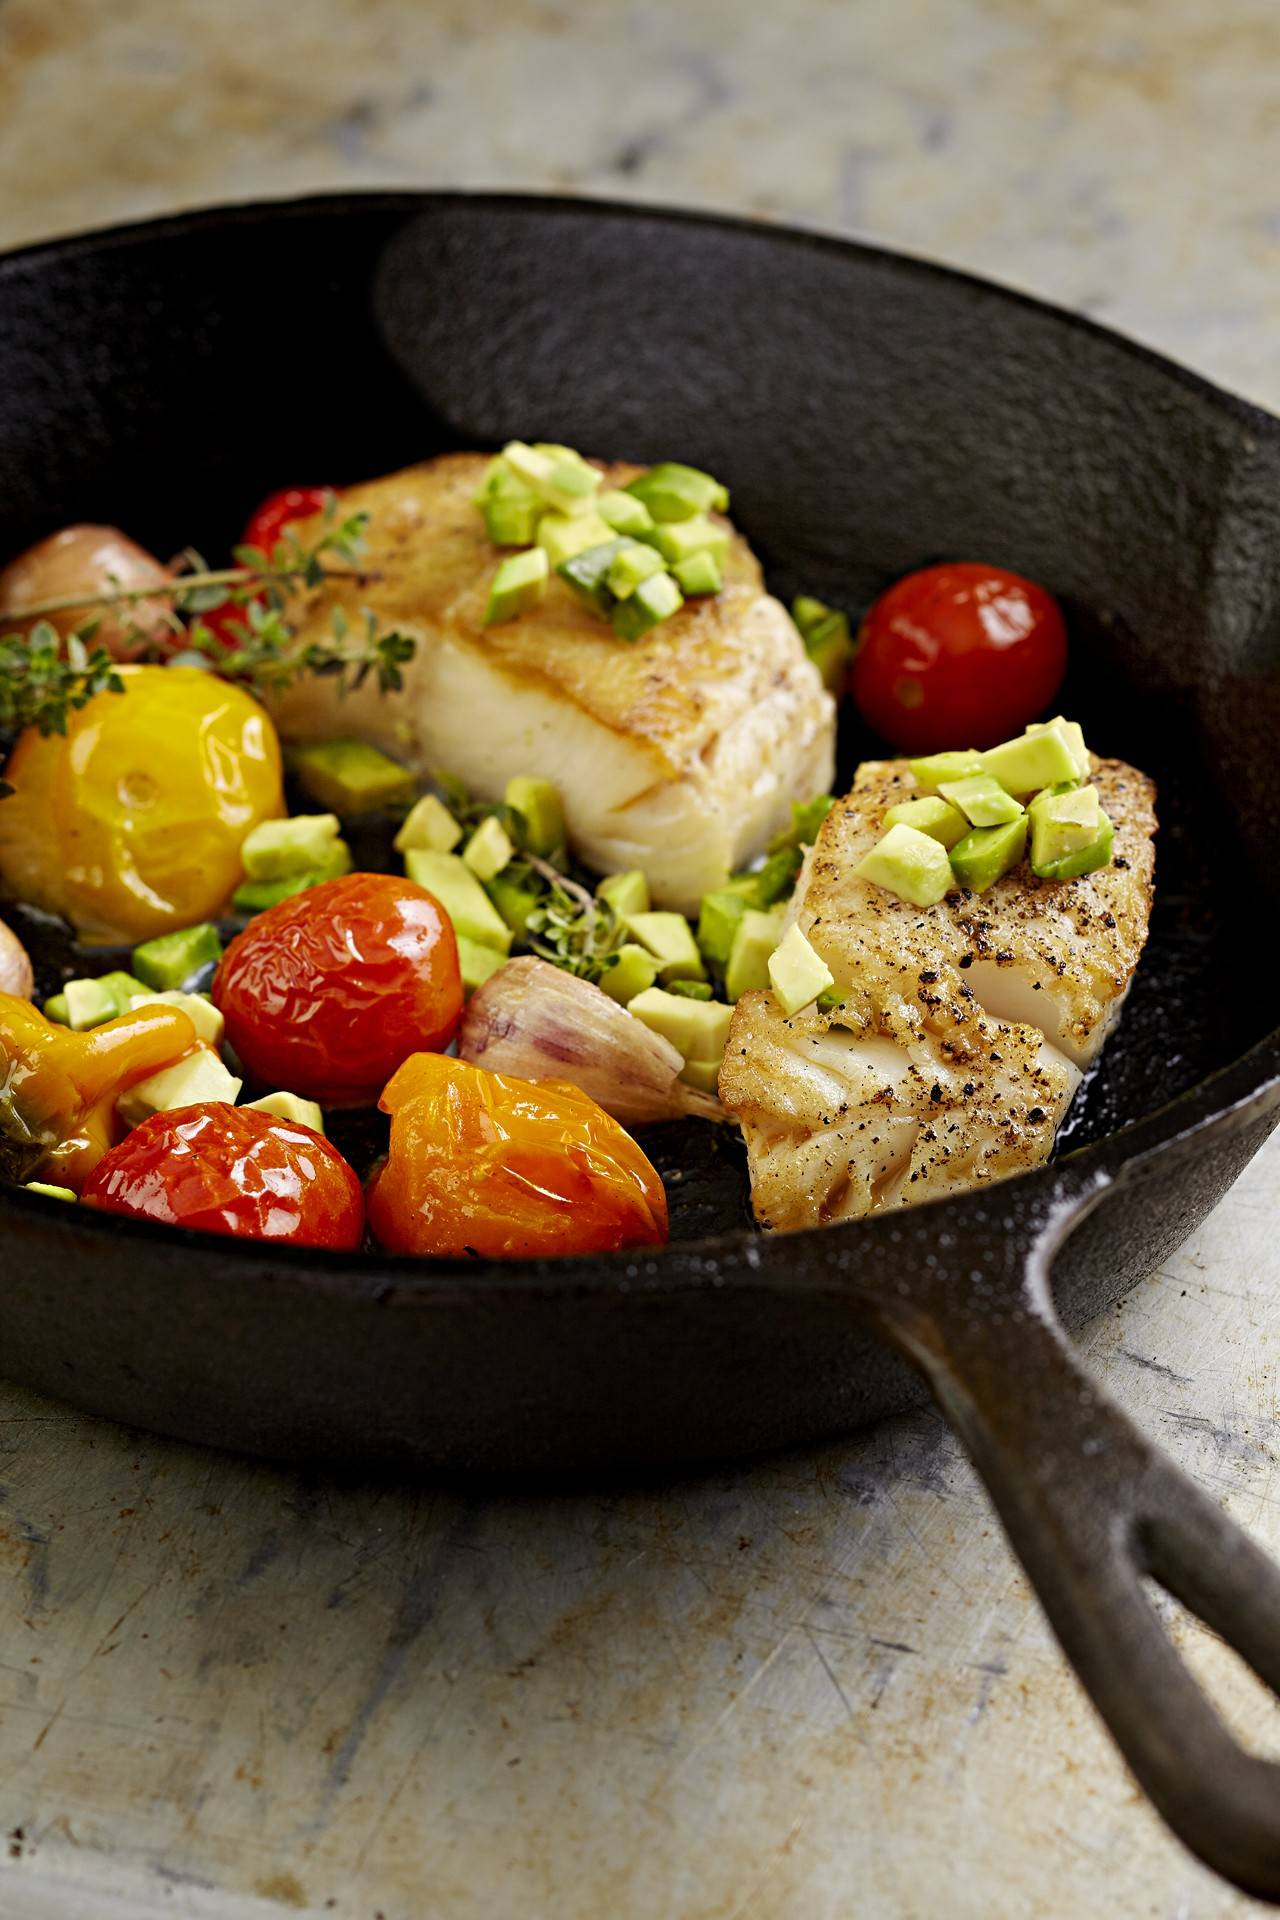 sable fish and pan roasted veggies